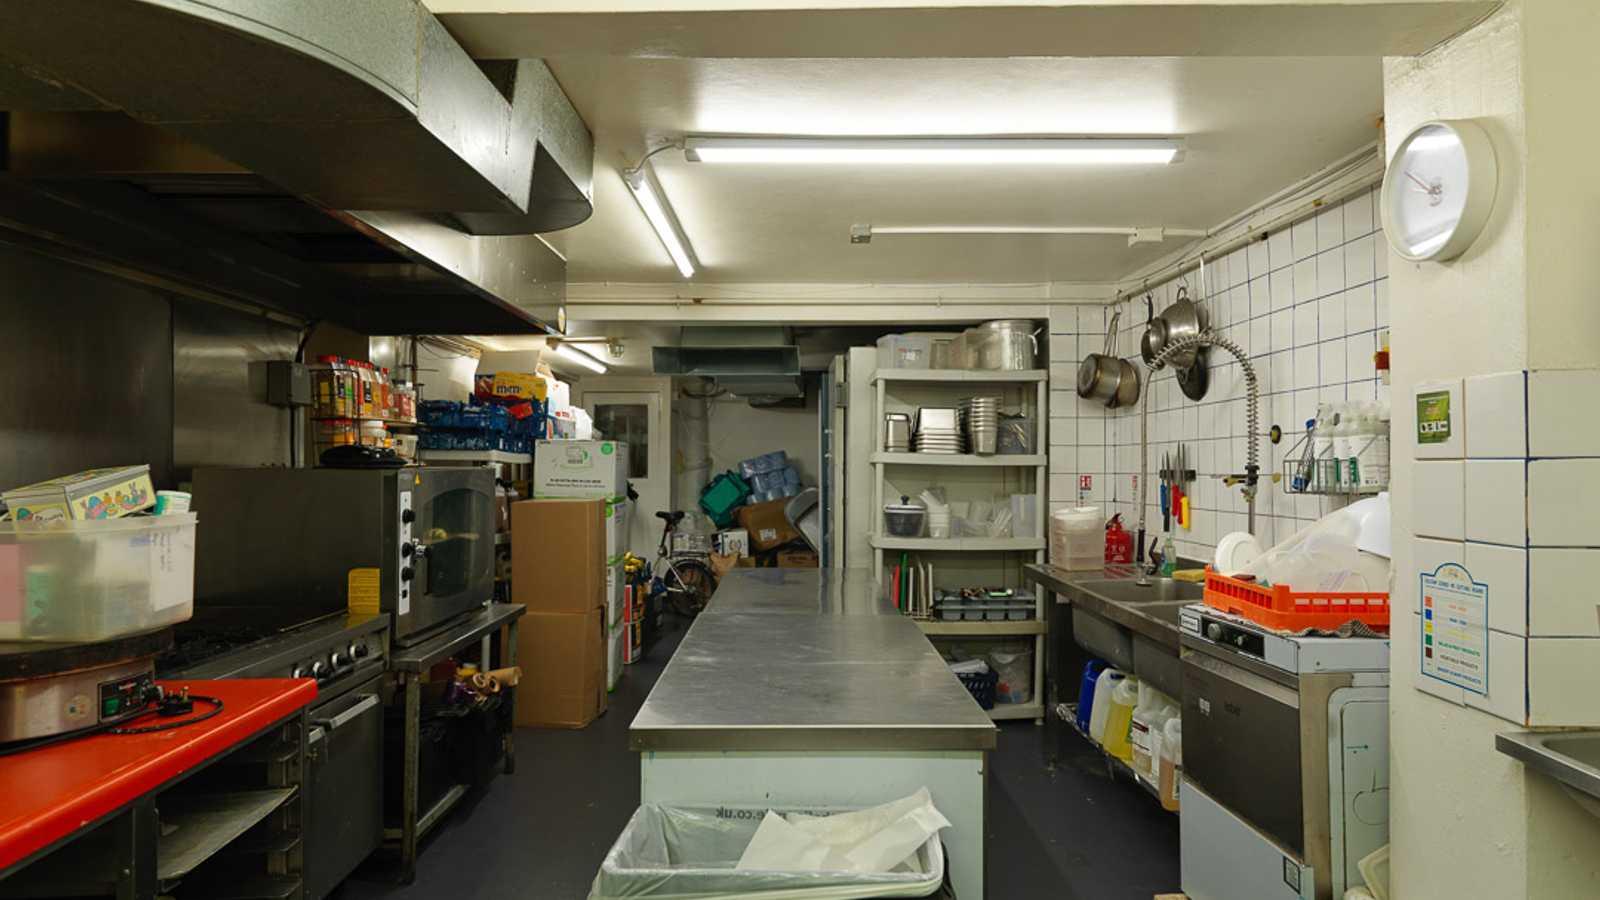 Creperie Kitchen